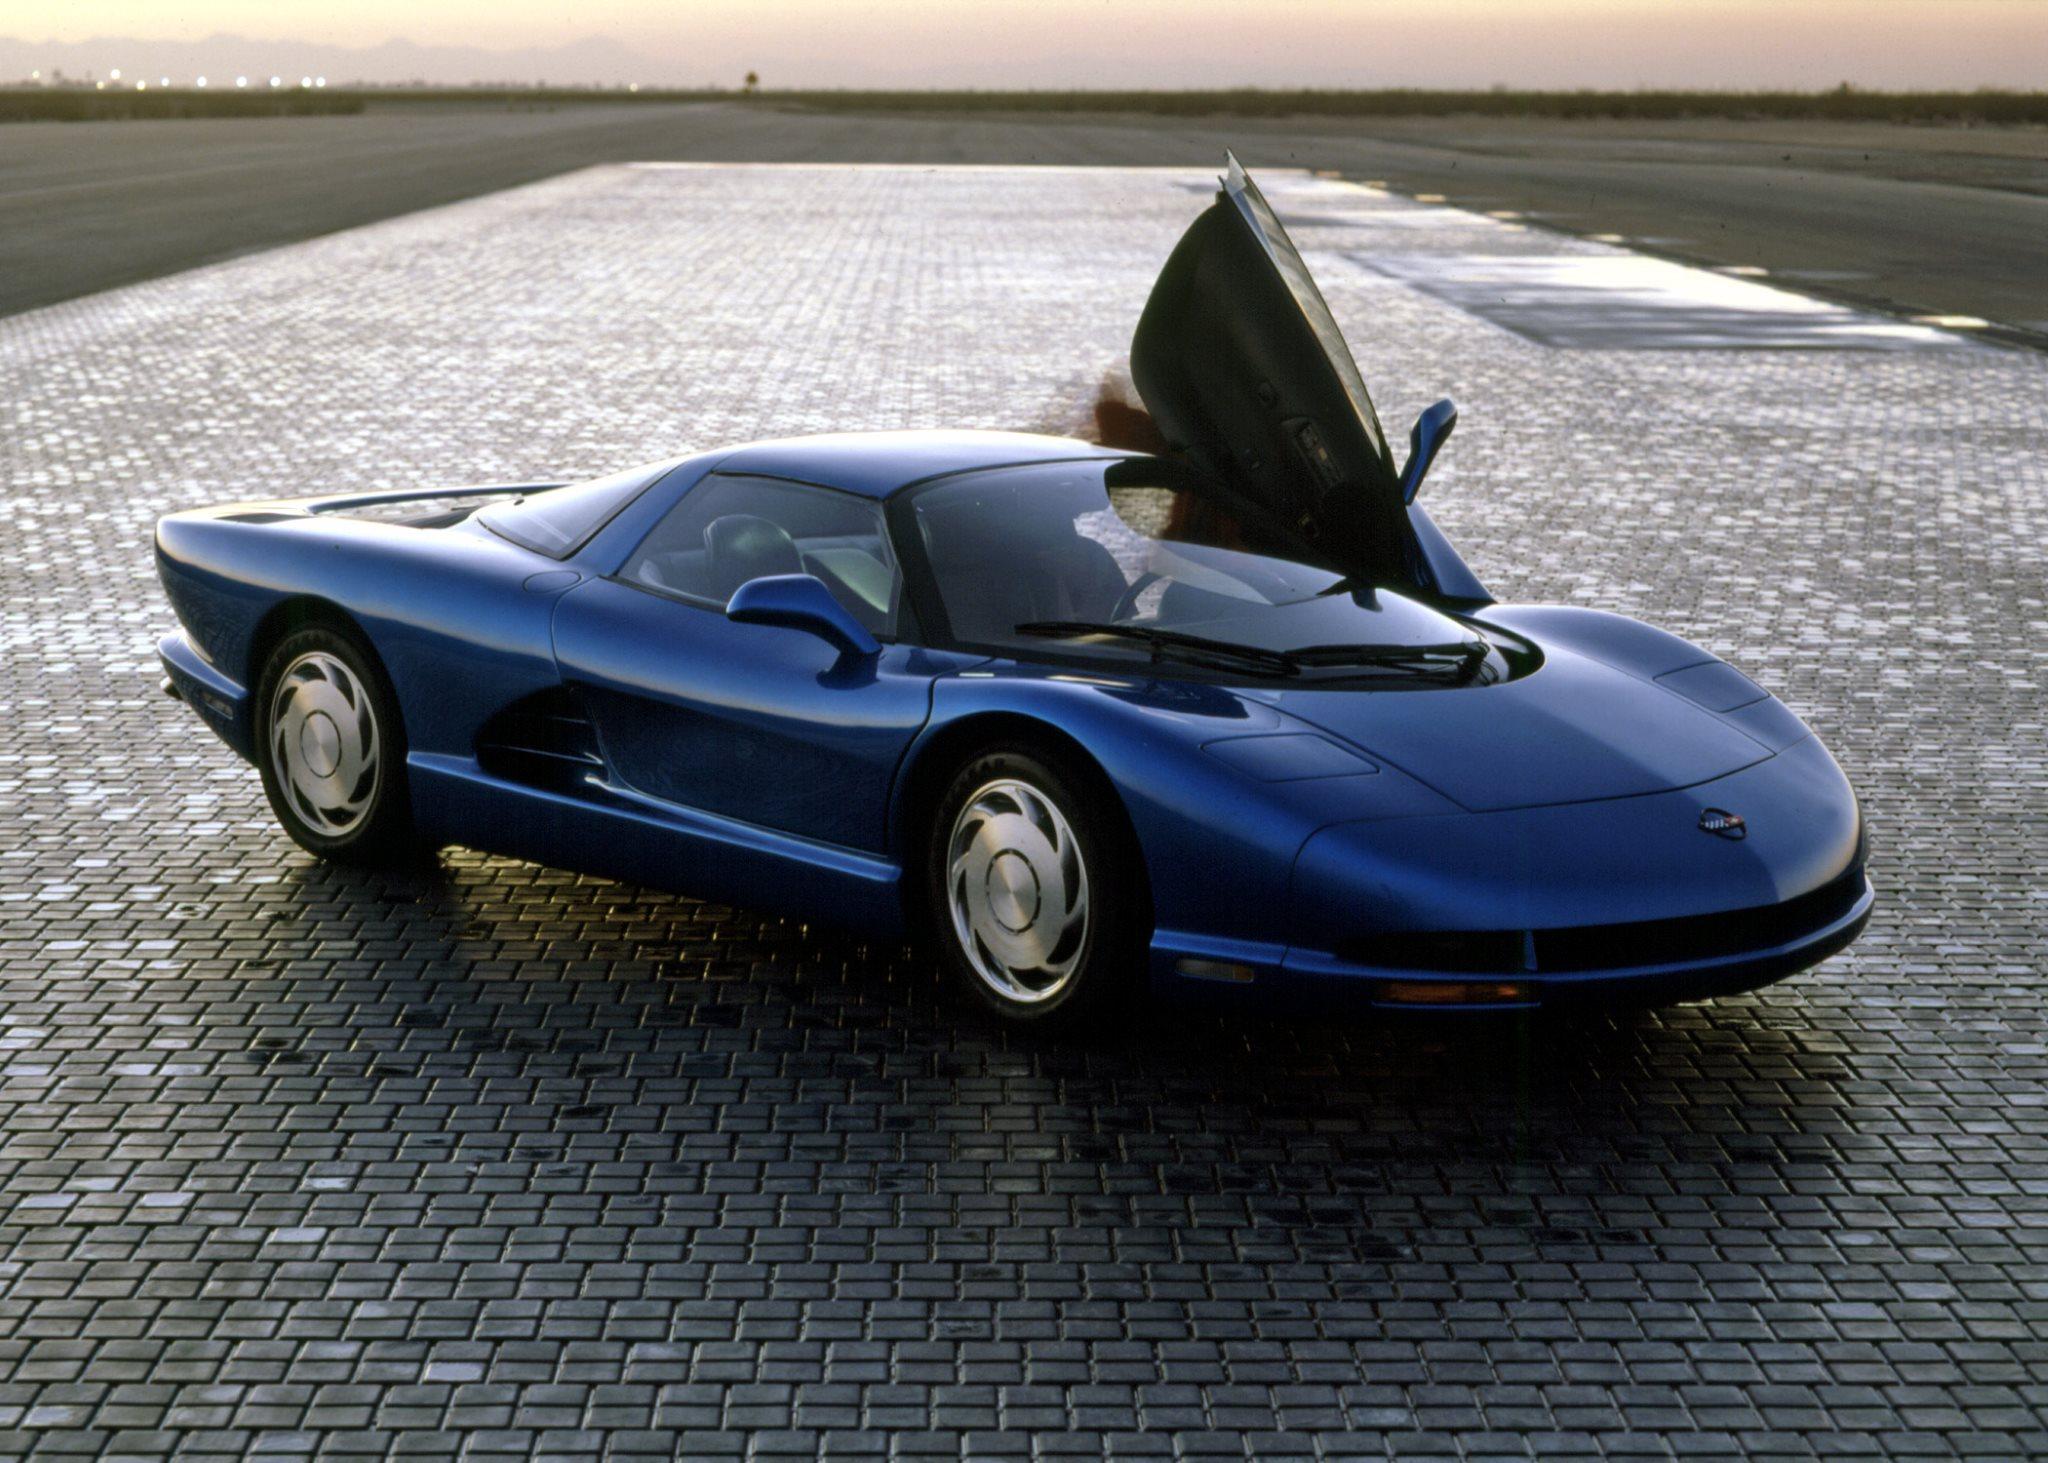 1990-GM-Cerv-III-Concept-Car-C7209-R58-0006.jpg